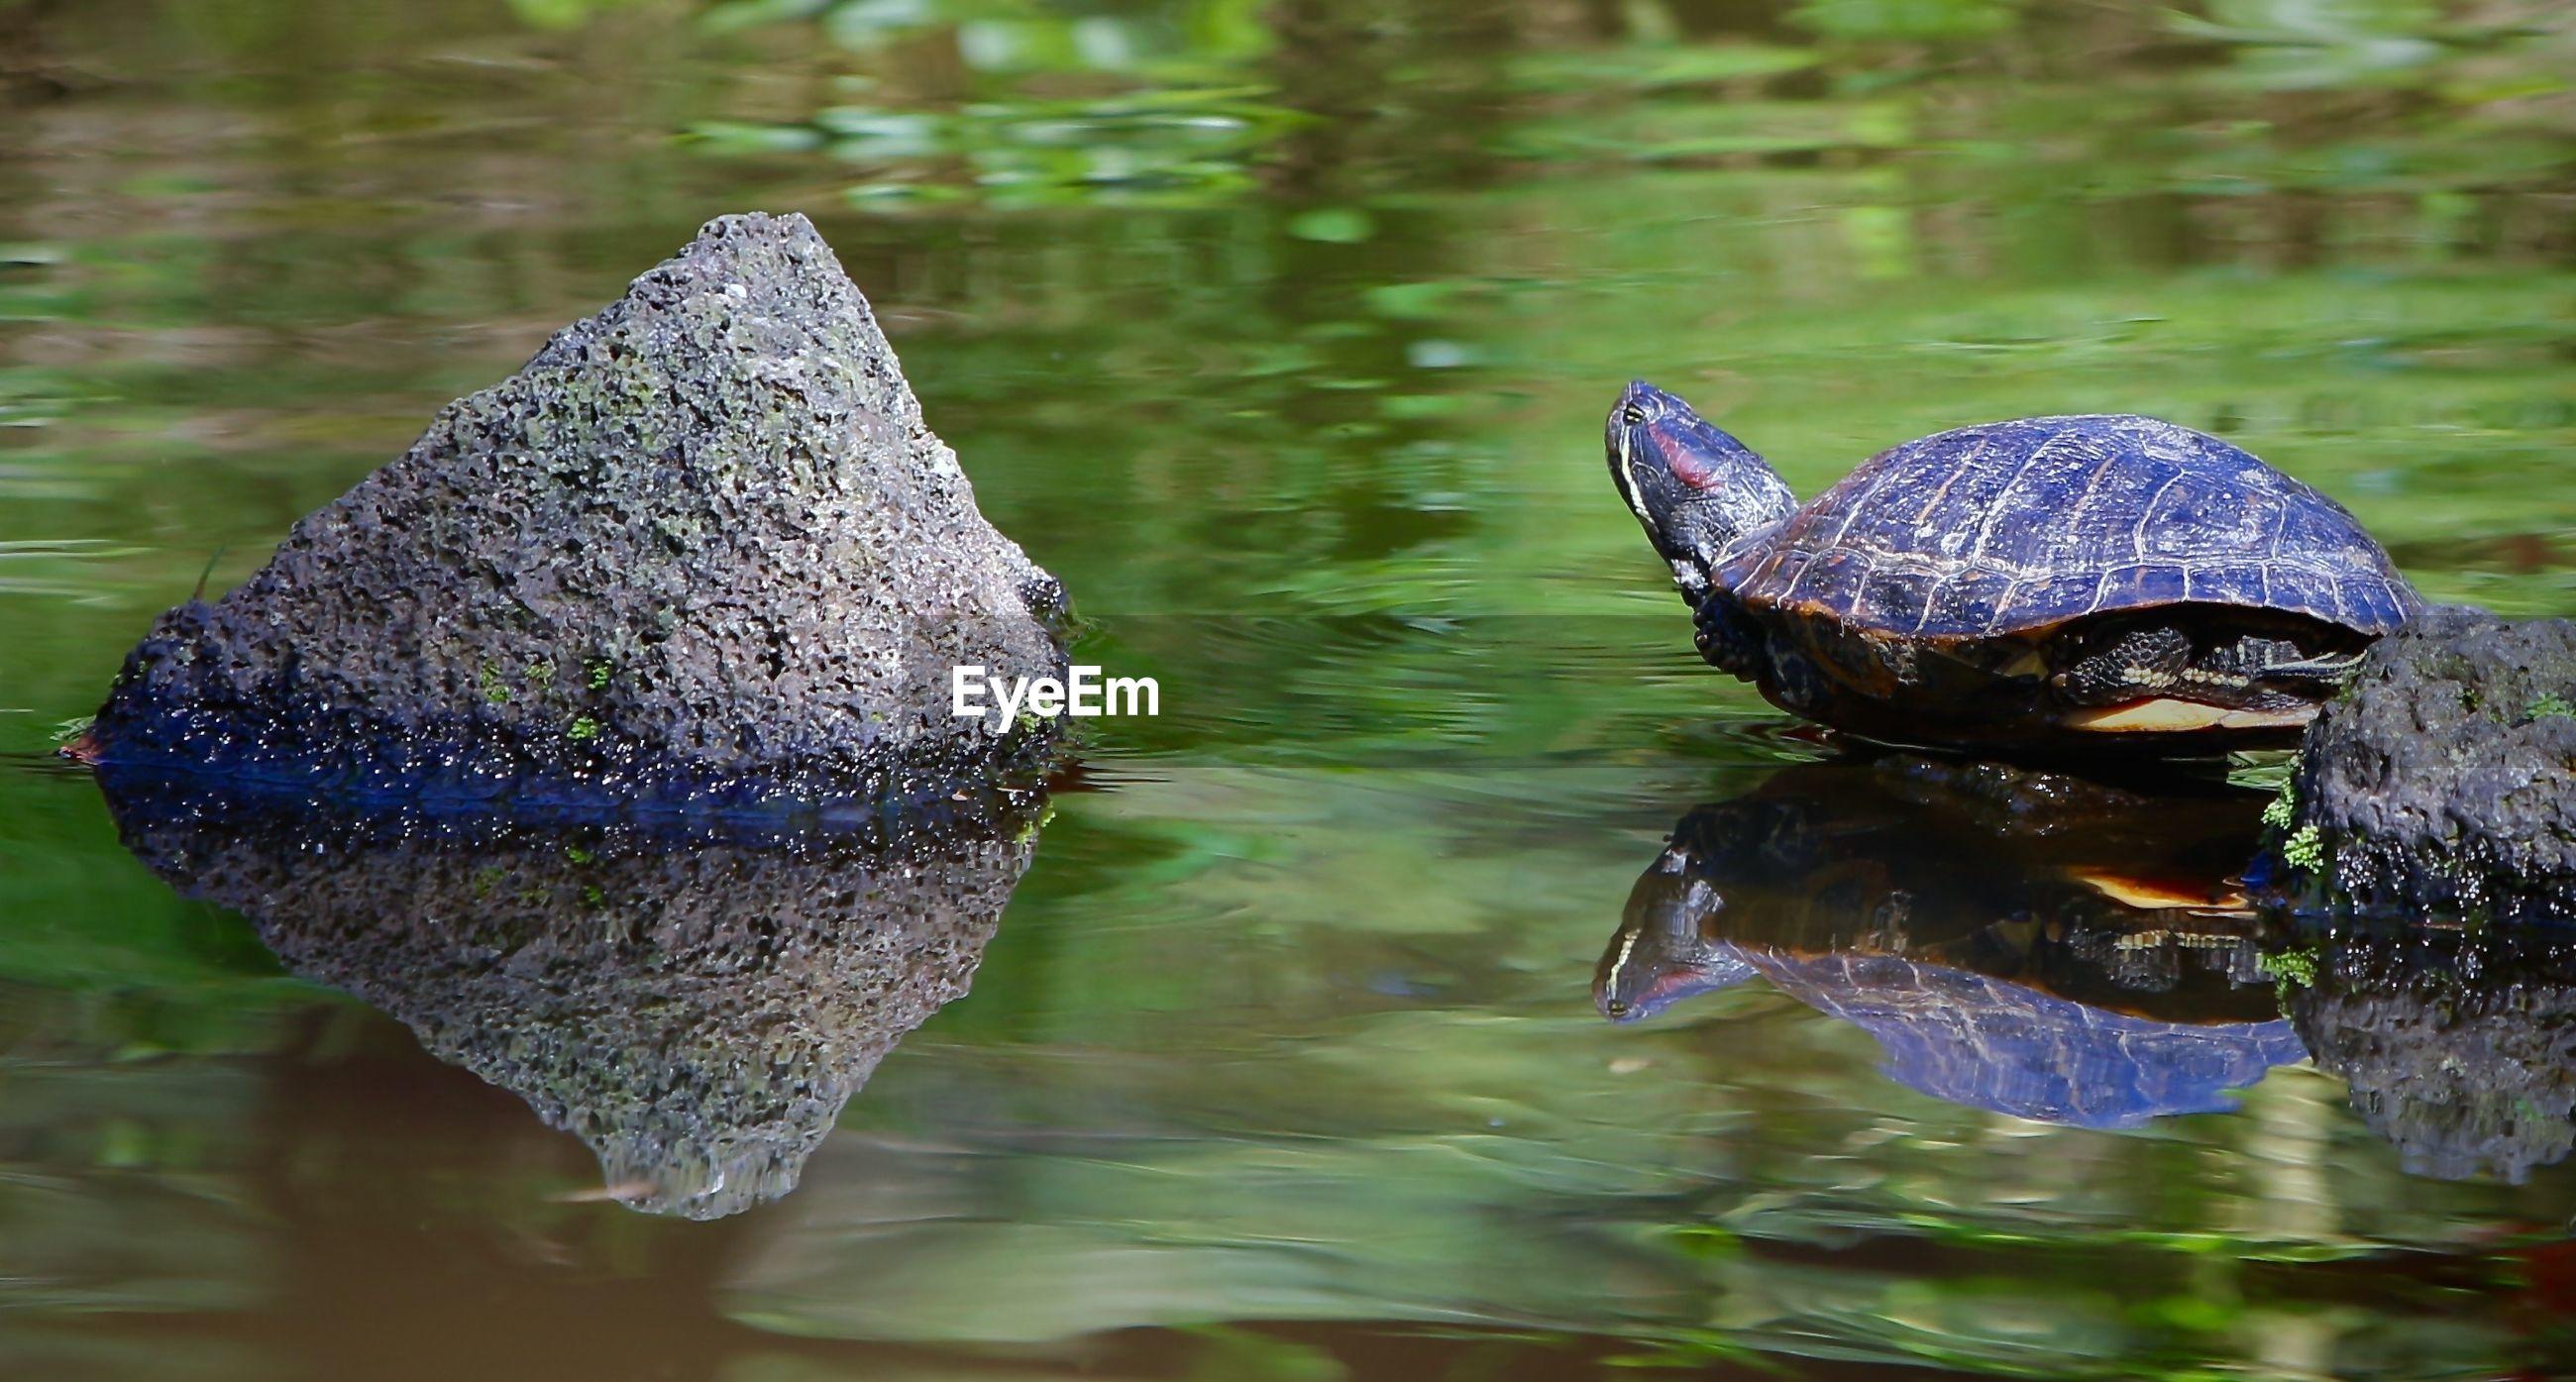 Turtle in pond by rocks